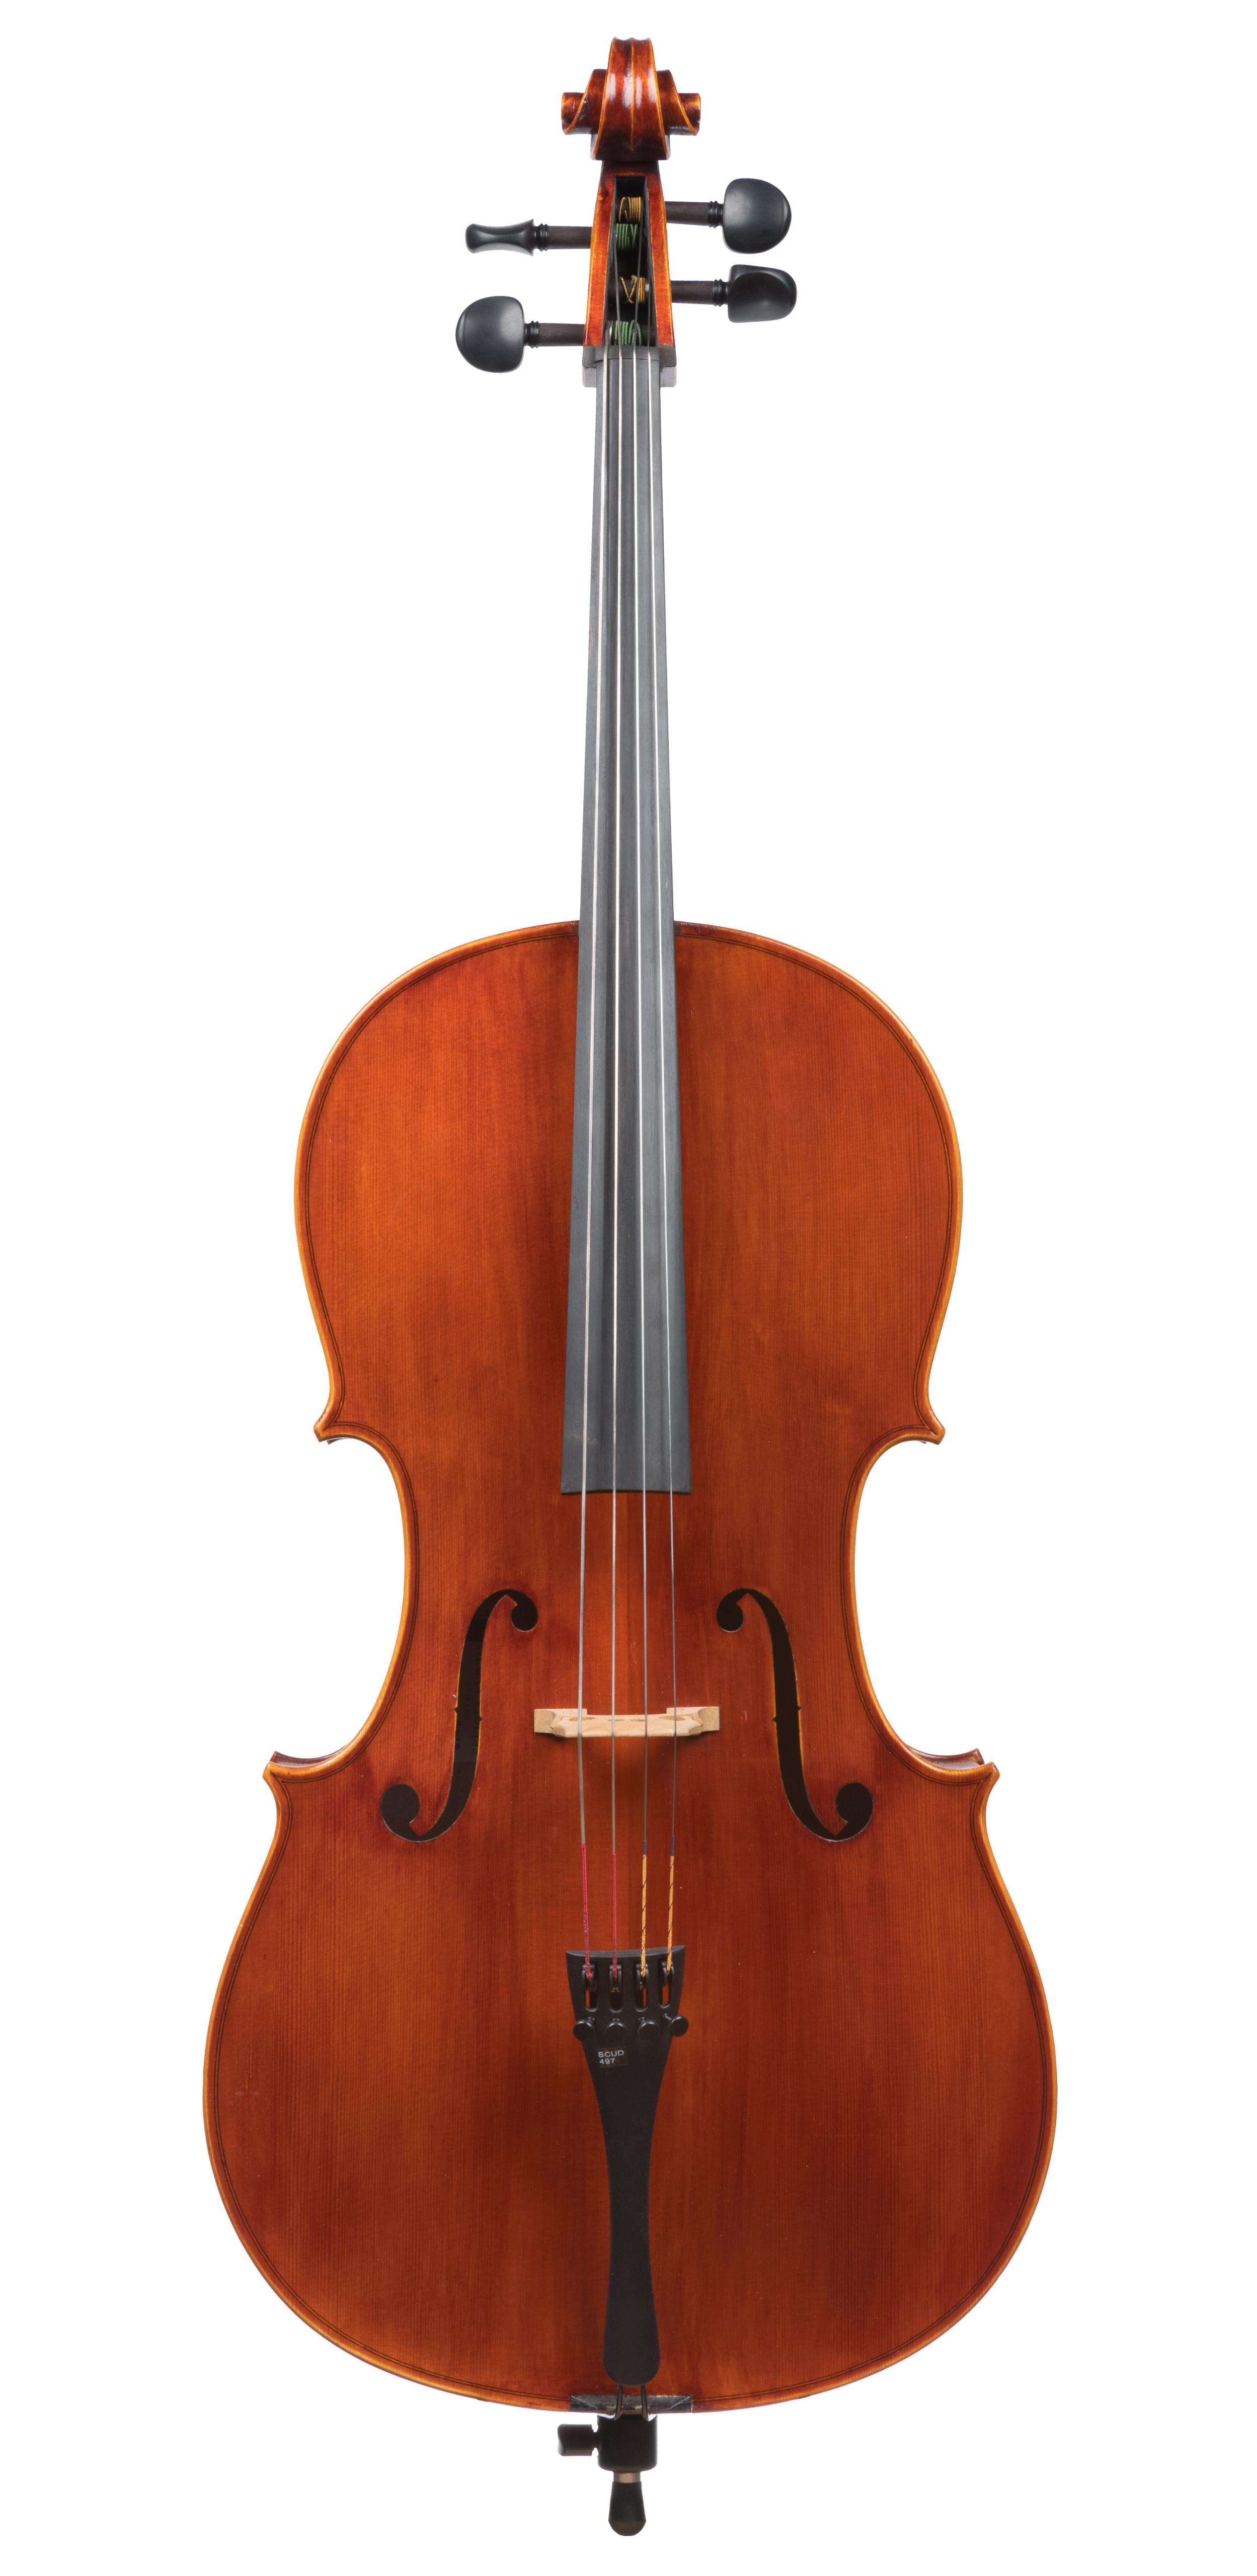 Seman Violins SVC70 3/4 Cello -